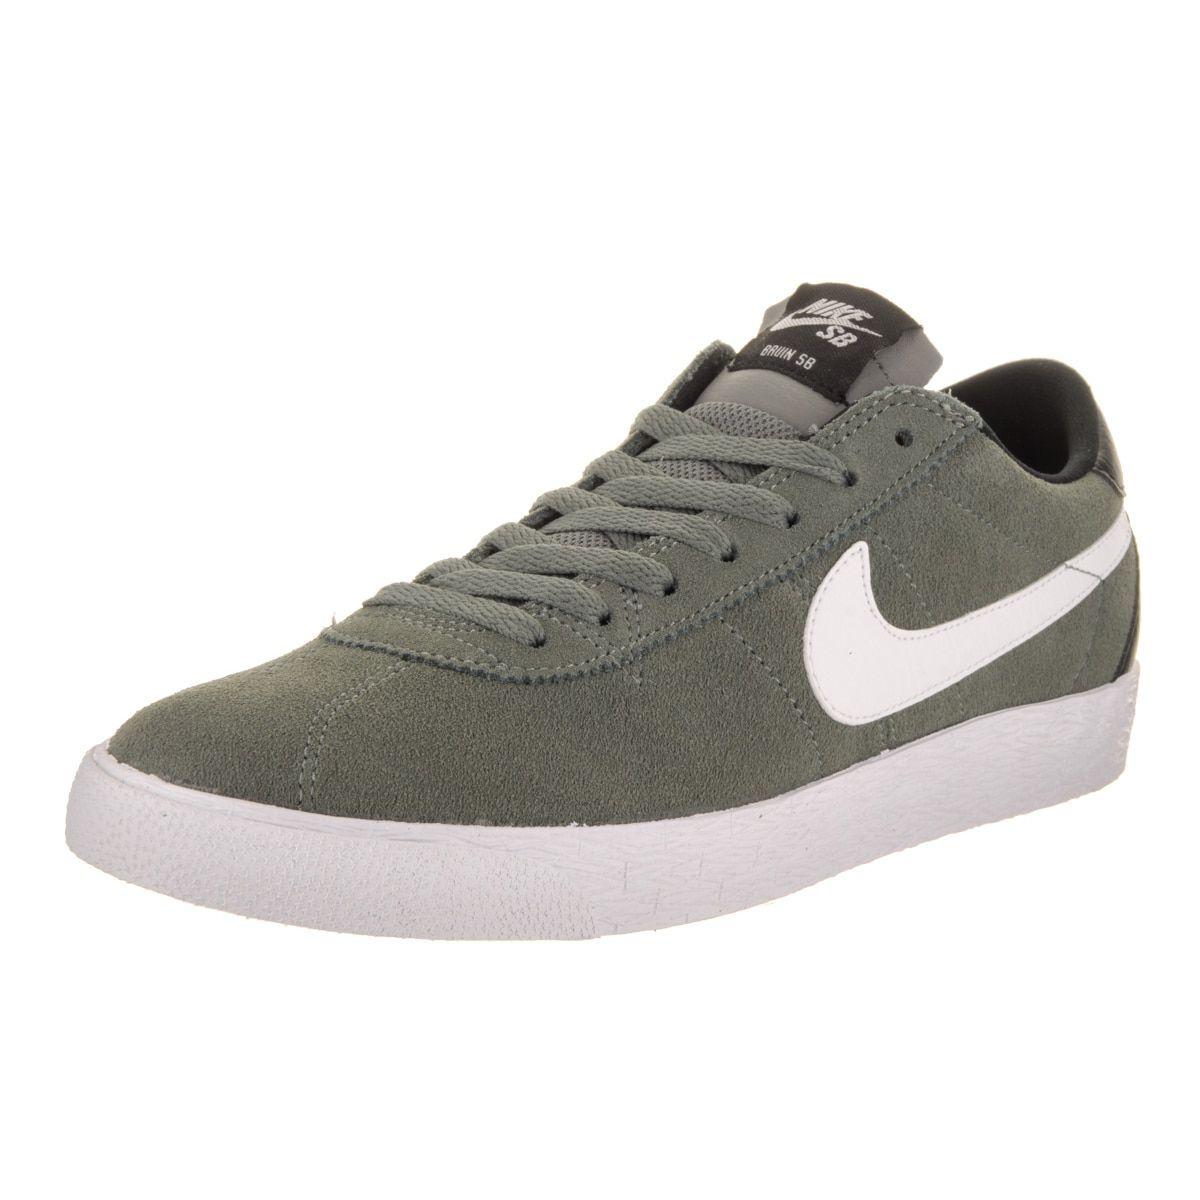 Zapatillas ultraligeras para skate Nike Sb Portmoire II, gris / blanco 10.5